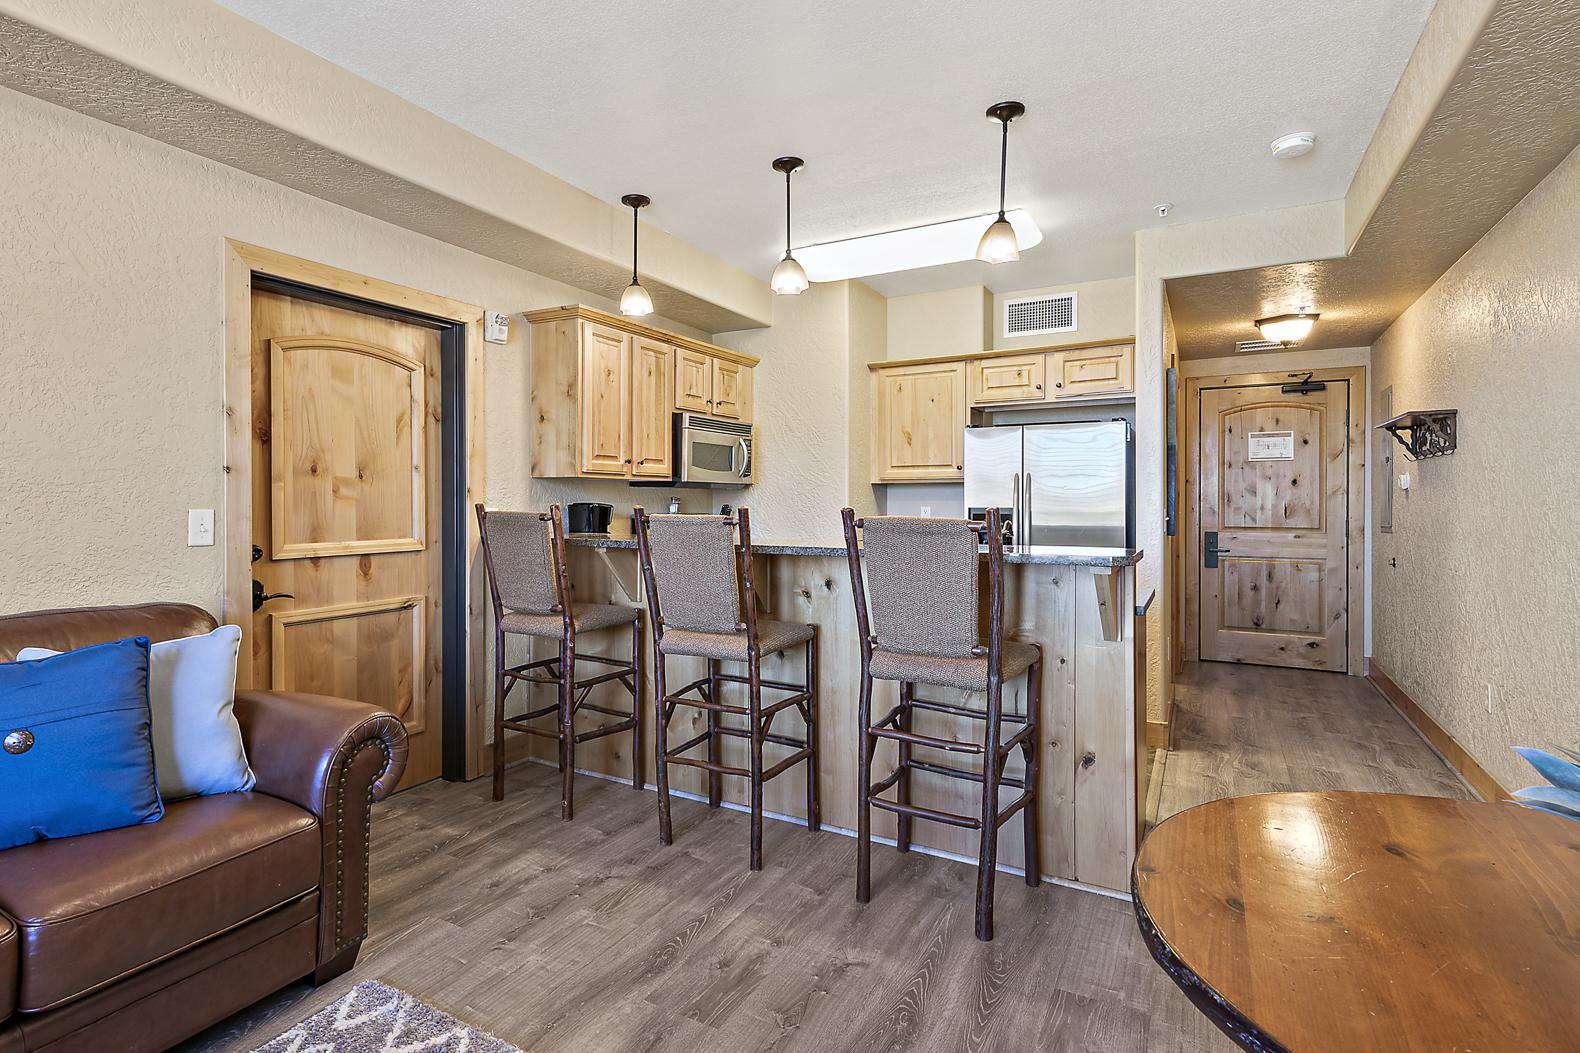 Living room and breakfast bar with closed master bedroom door